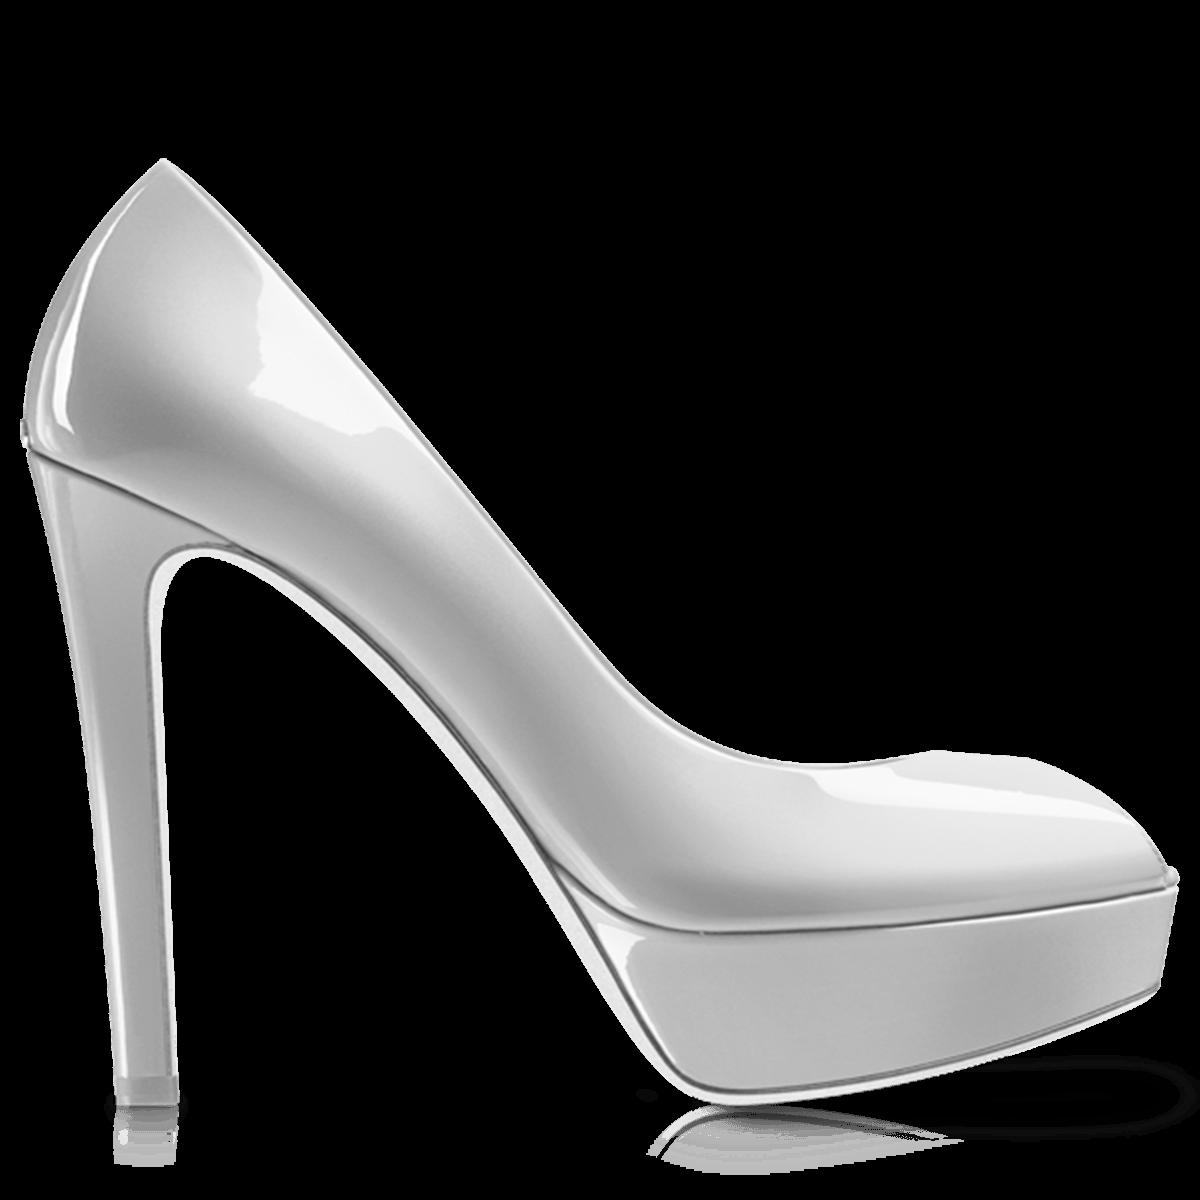 Womens Shoes Transparent Background